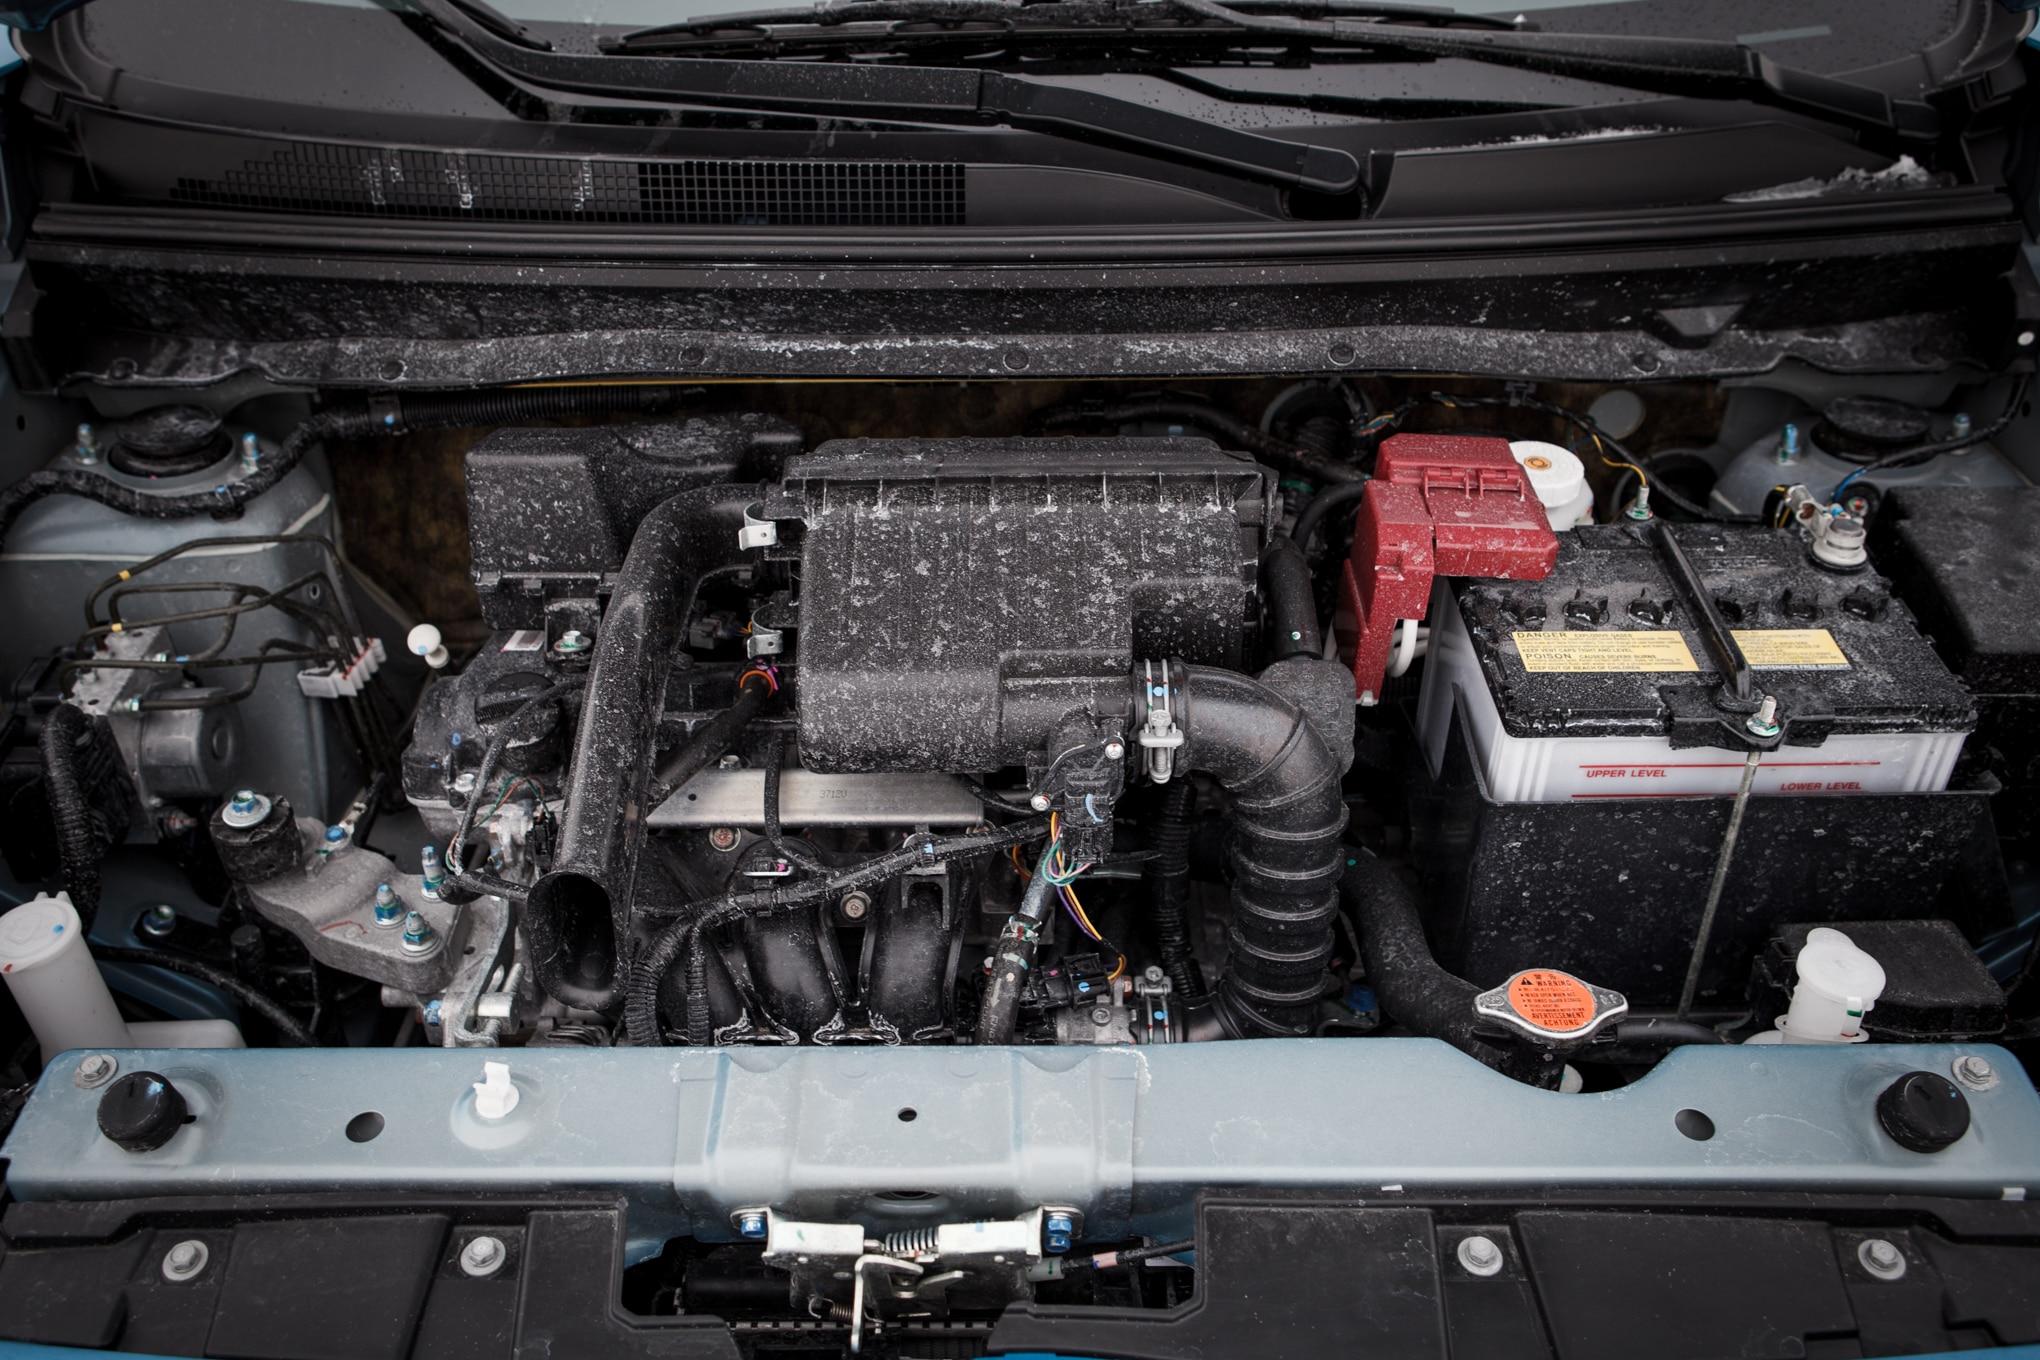 1997 Volvo S90 Fuse Box Electrical Wiring Diagram Engine 2014 Mitsubishi Mirage Pontiac Sunfire 1998 850